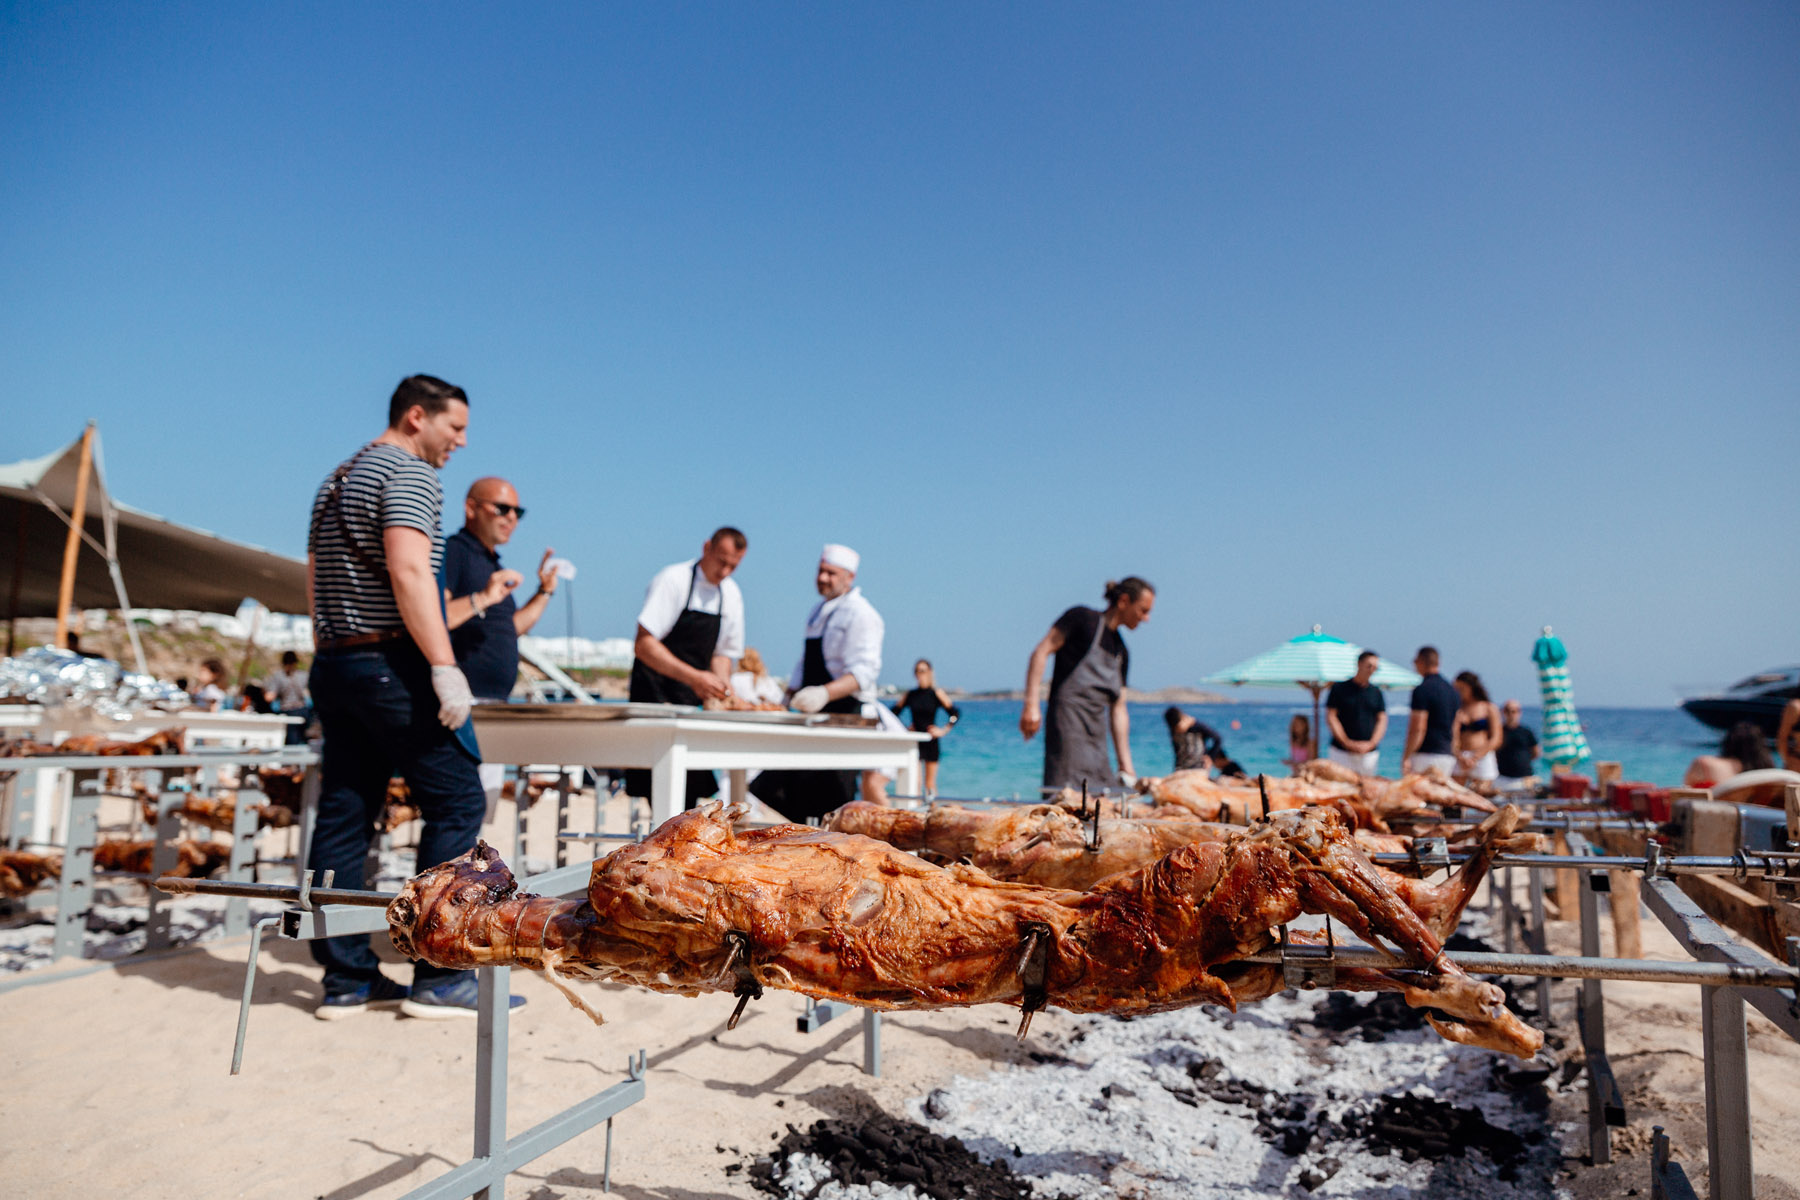 Greek Orthodox Easter celebration at Nammos beach club